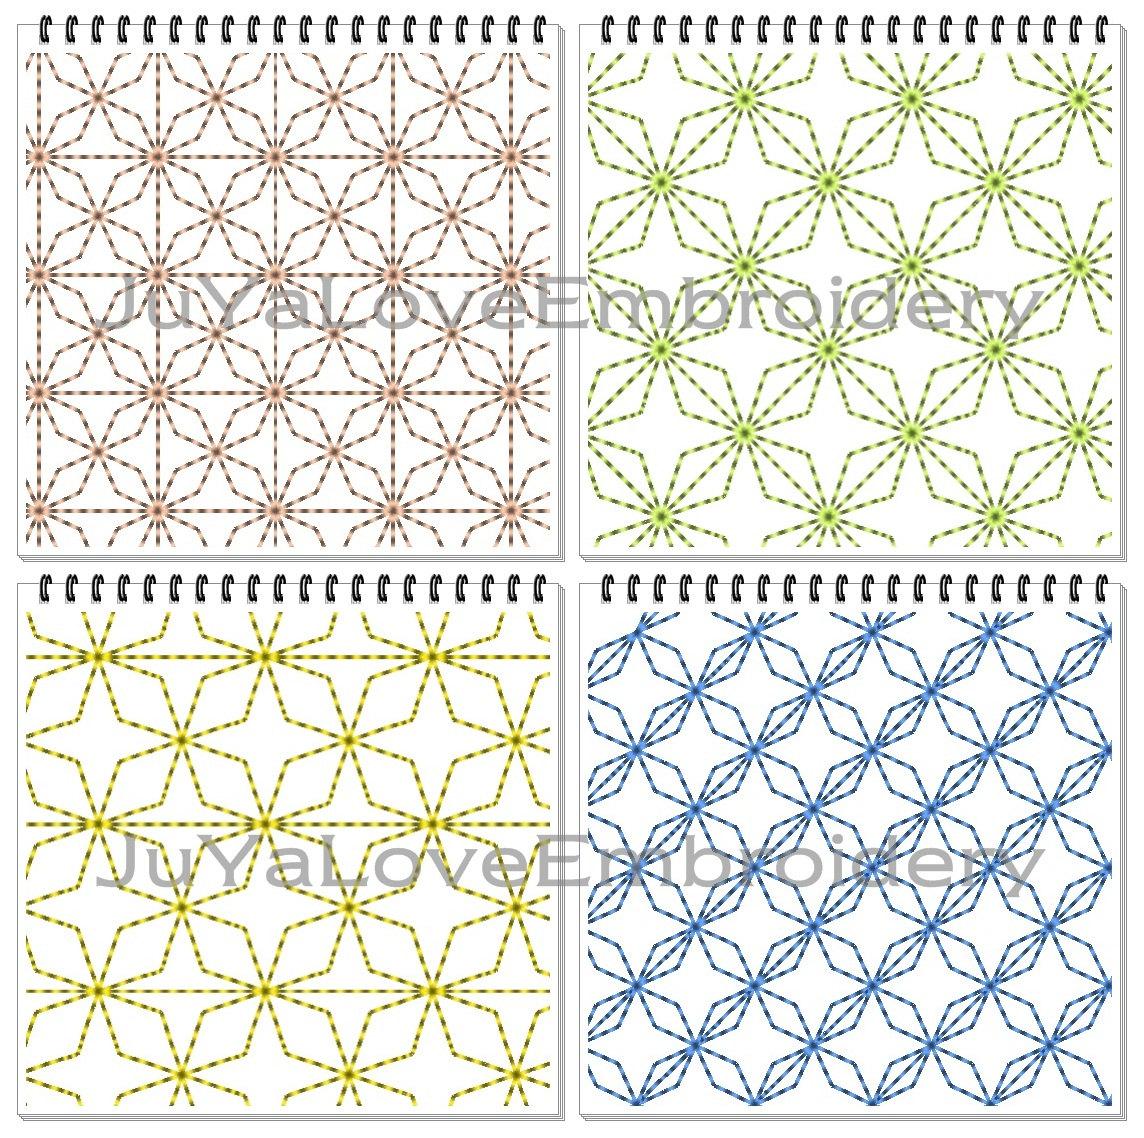 Sashiko Patterns Quilt blocks Quilting Four patterns : stippling quilt - Adamdwight.com